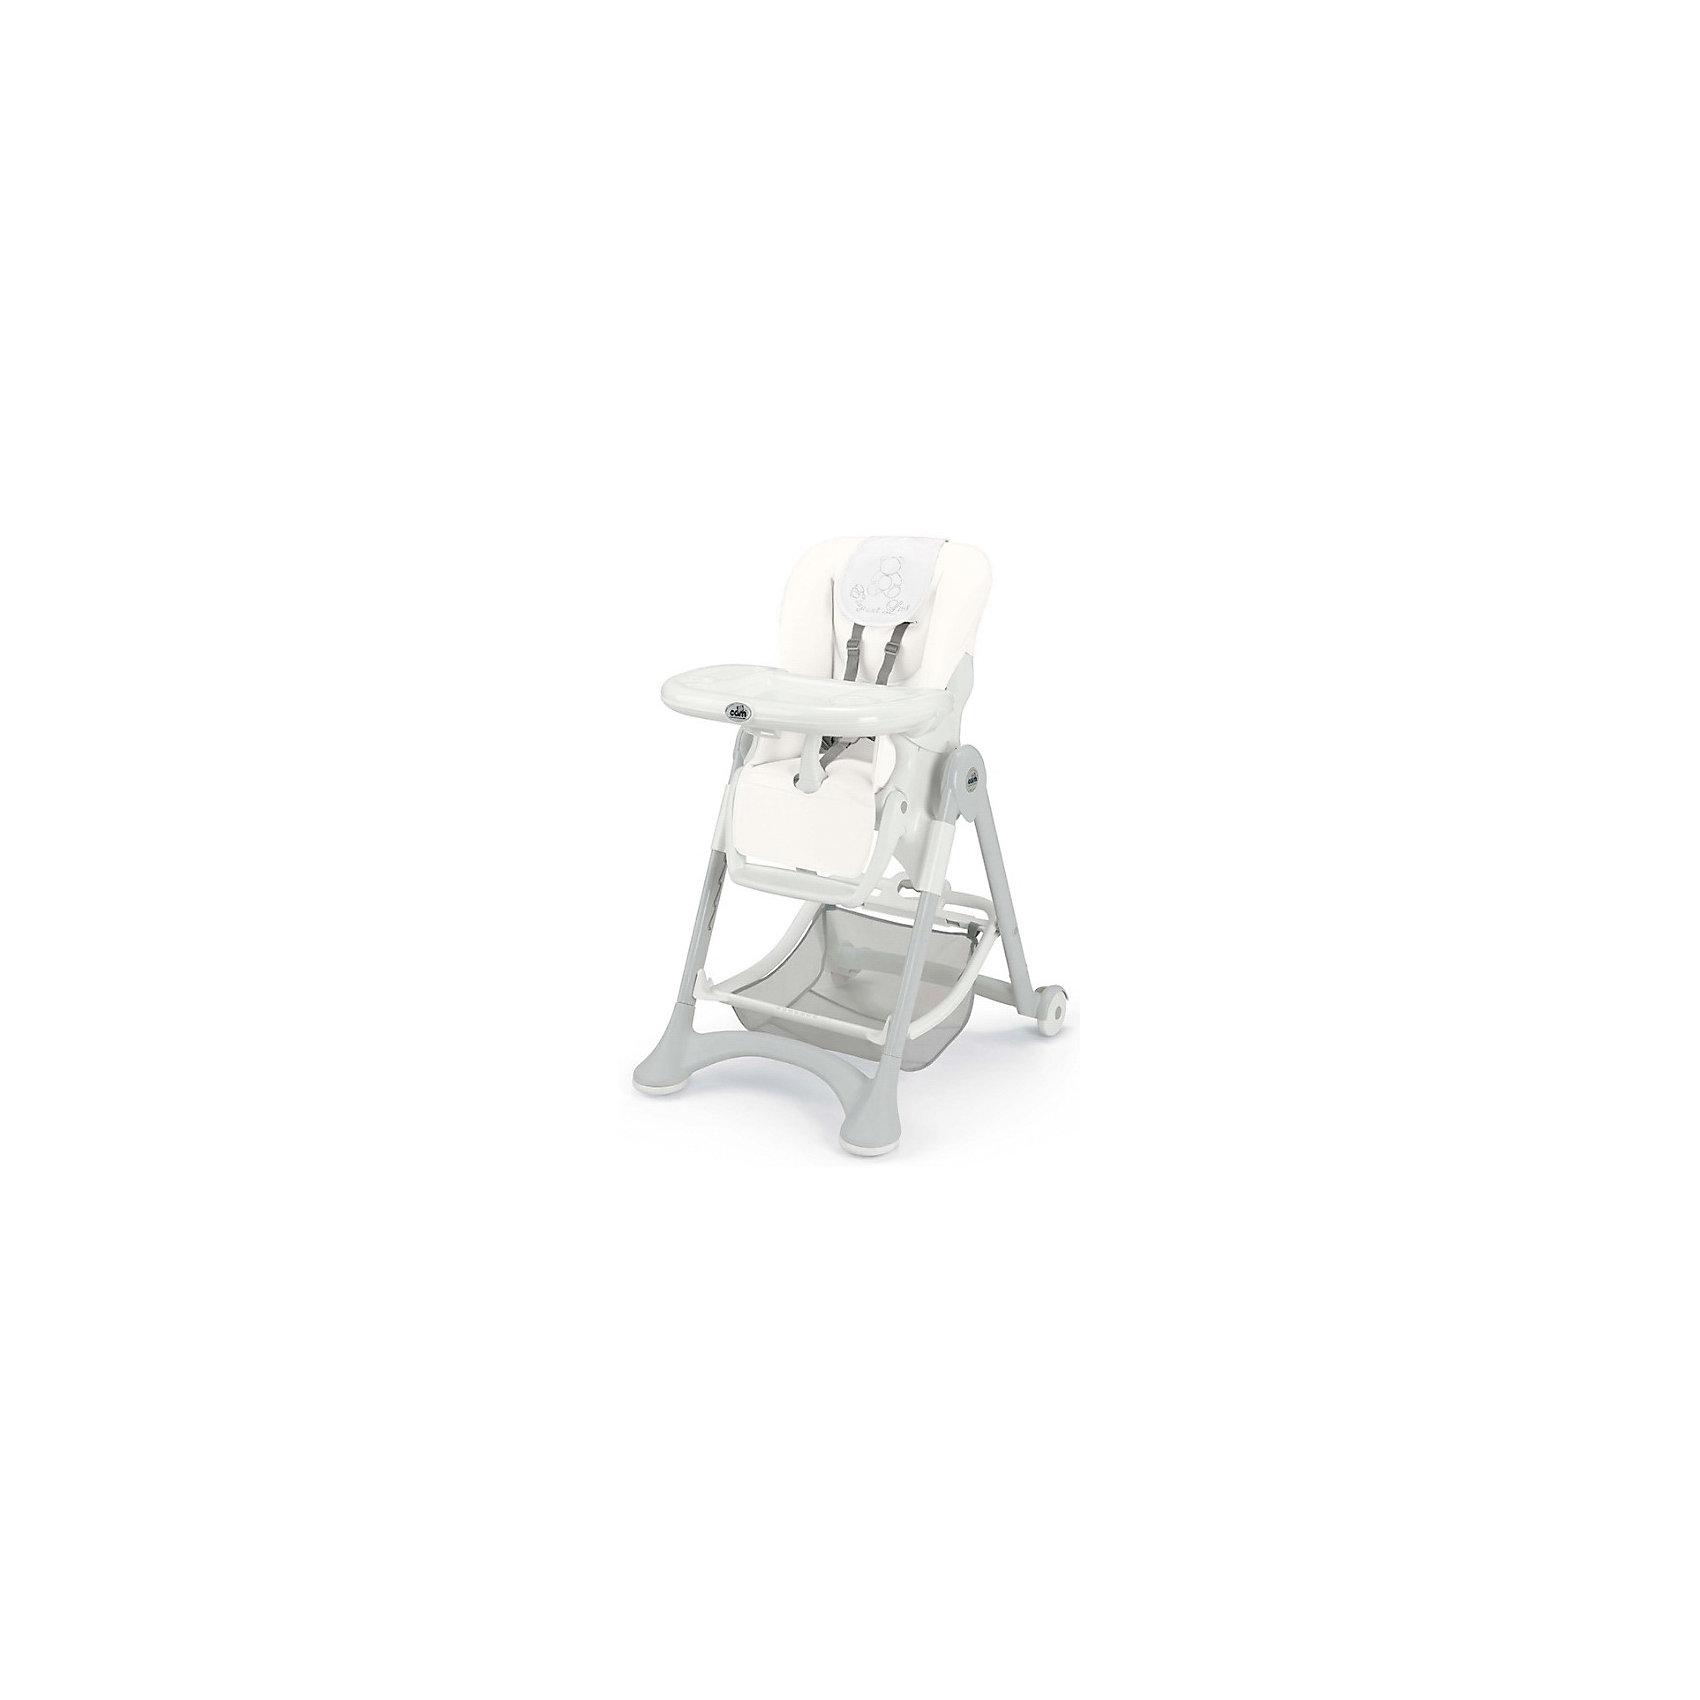 Стульчик для кормления Campione Elegant, CAM, White Leatherette